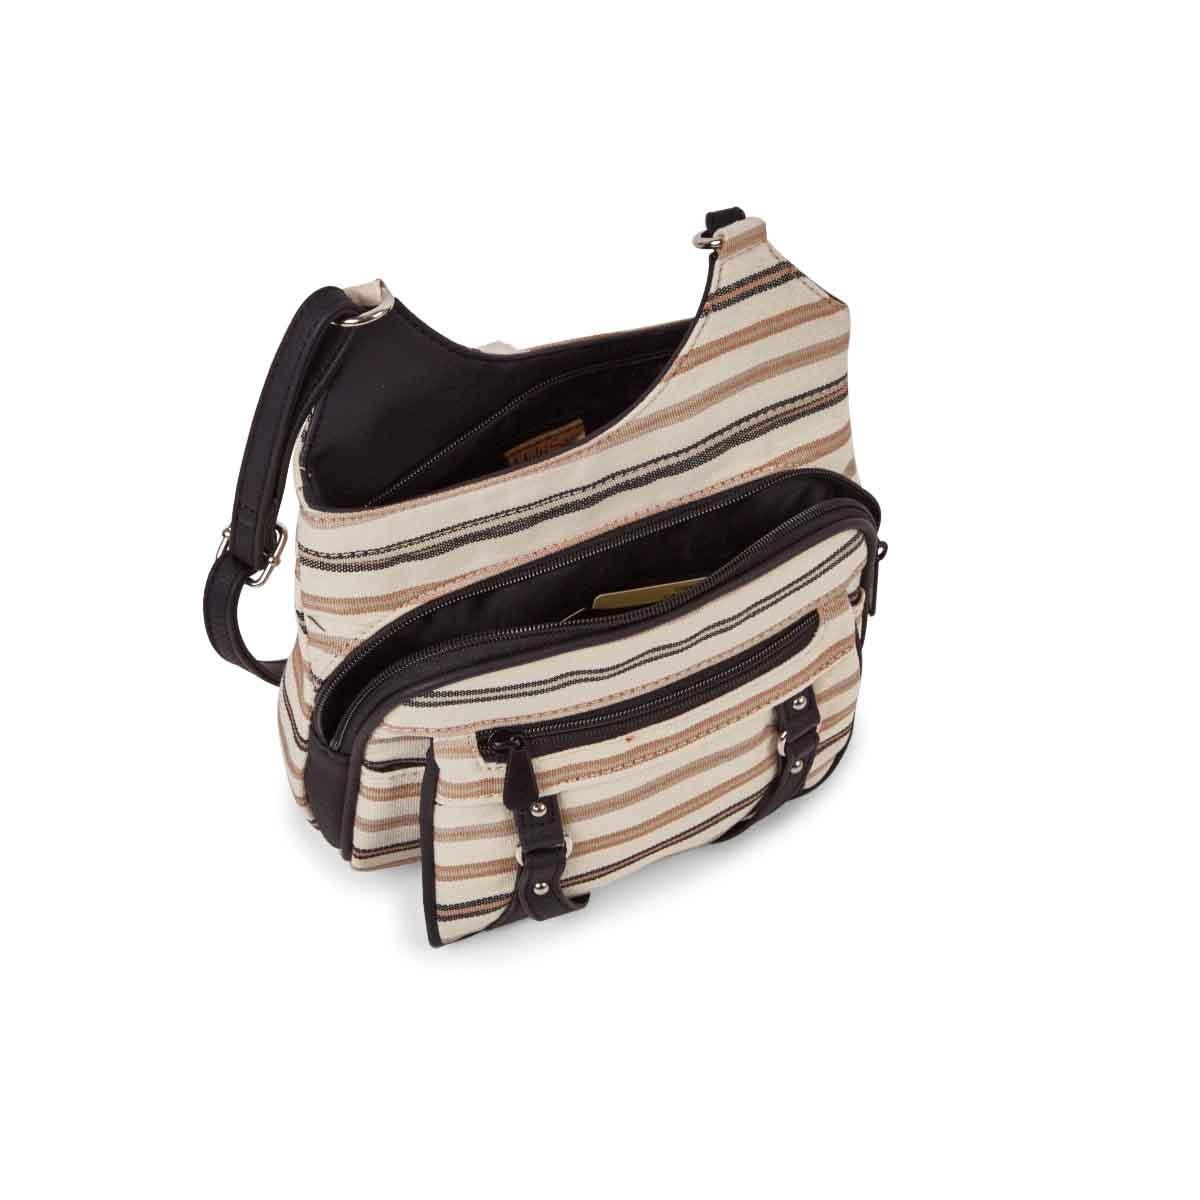 Lds Prime Classic black stripe crossbody